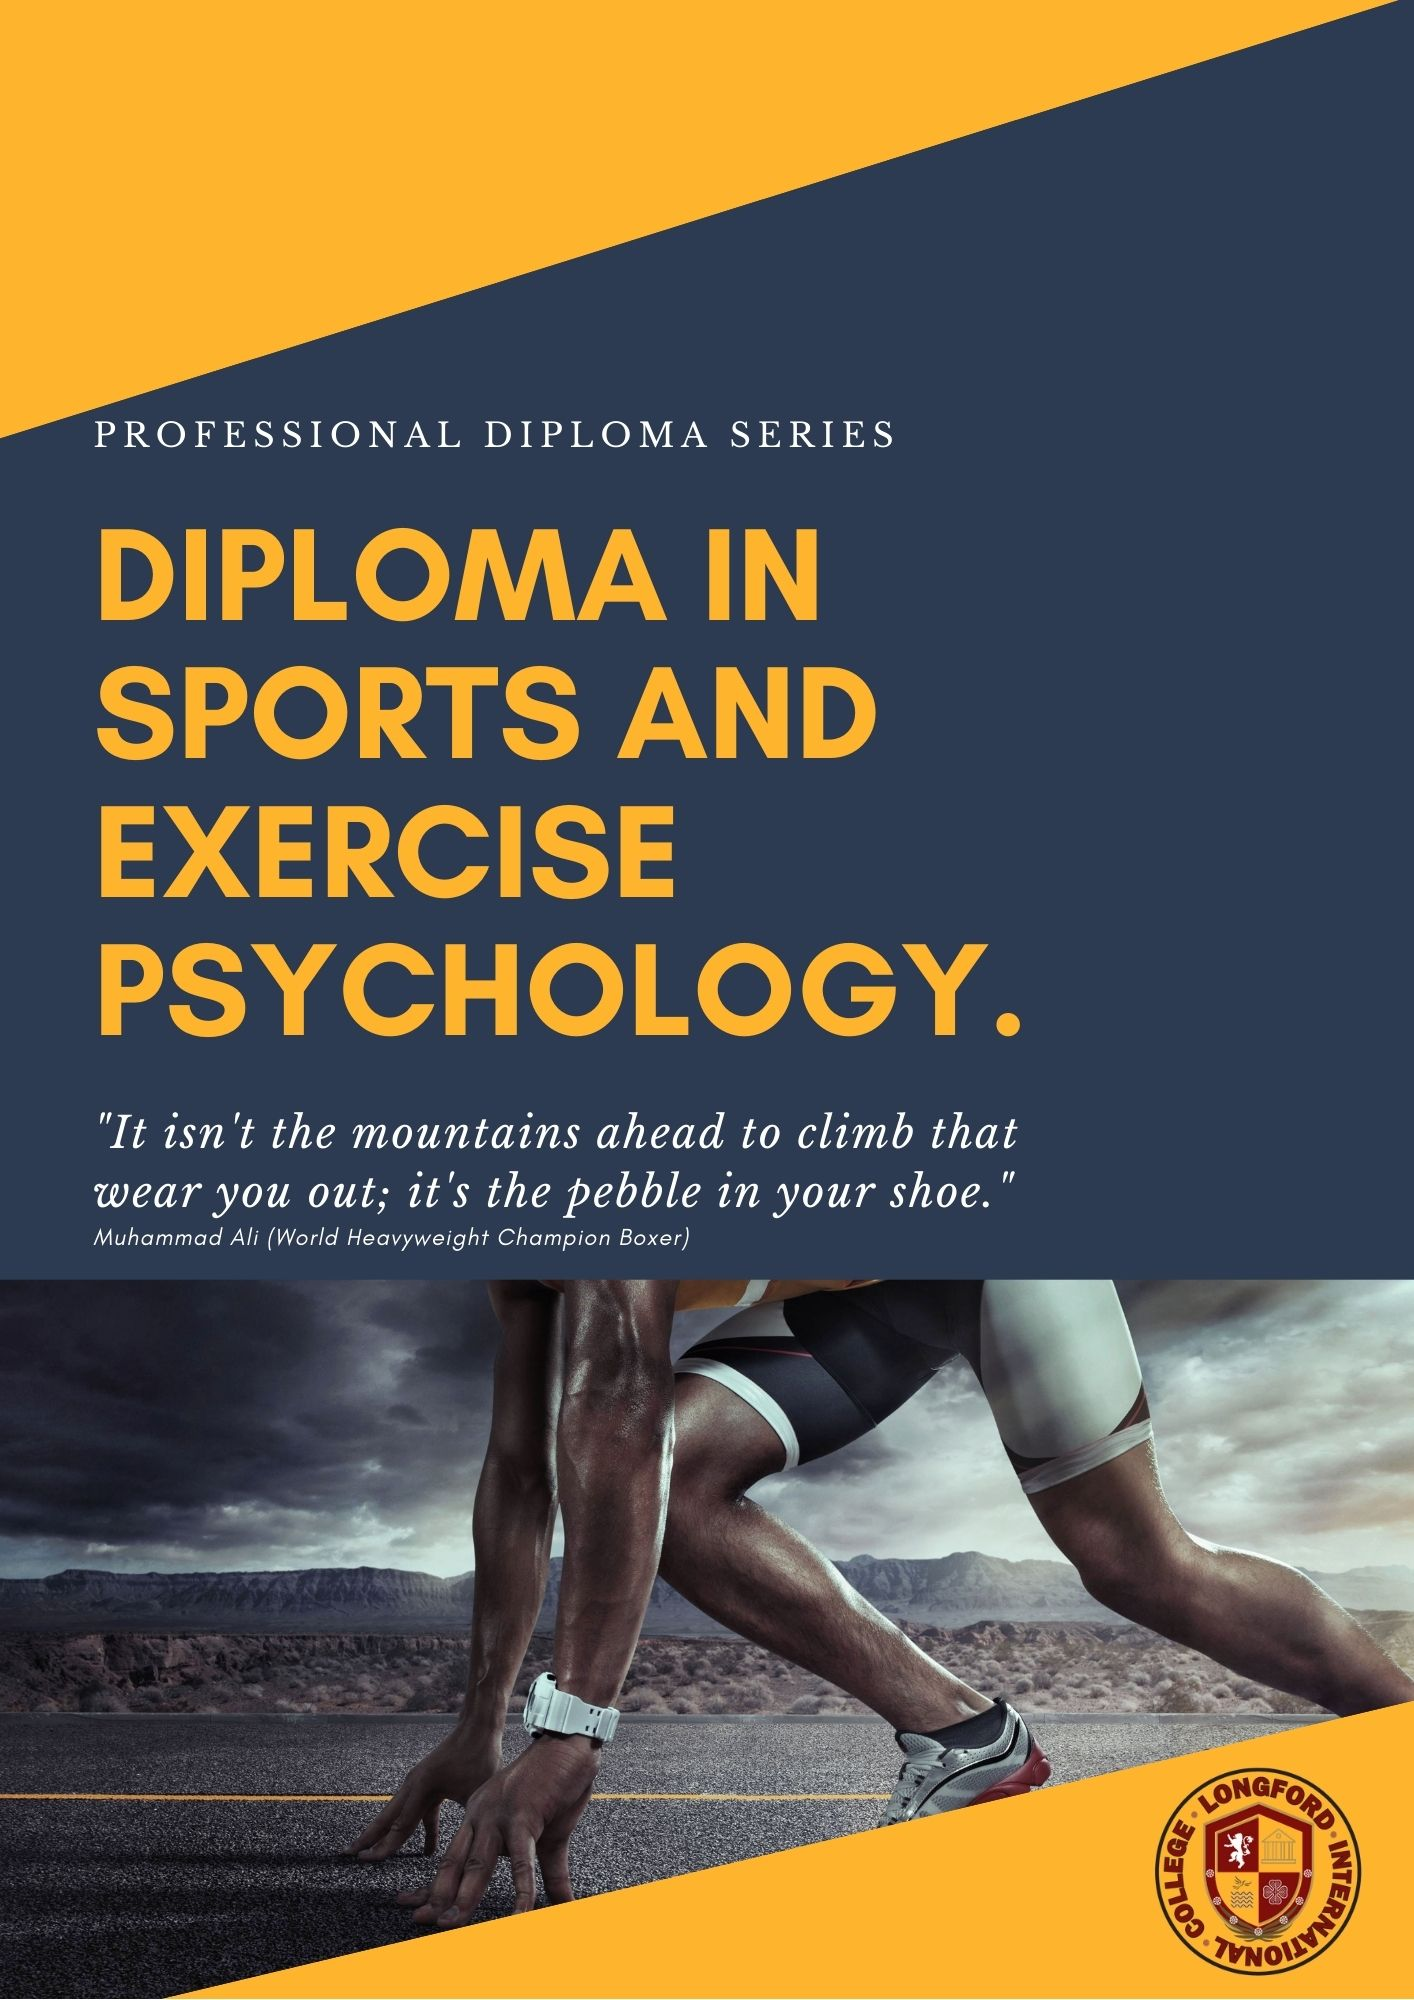 Professional-diploma-series-Sports-Psychology